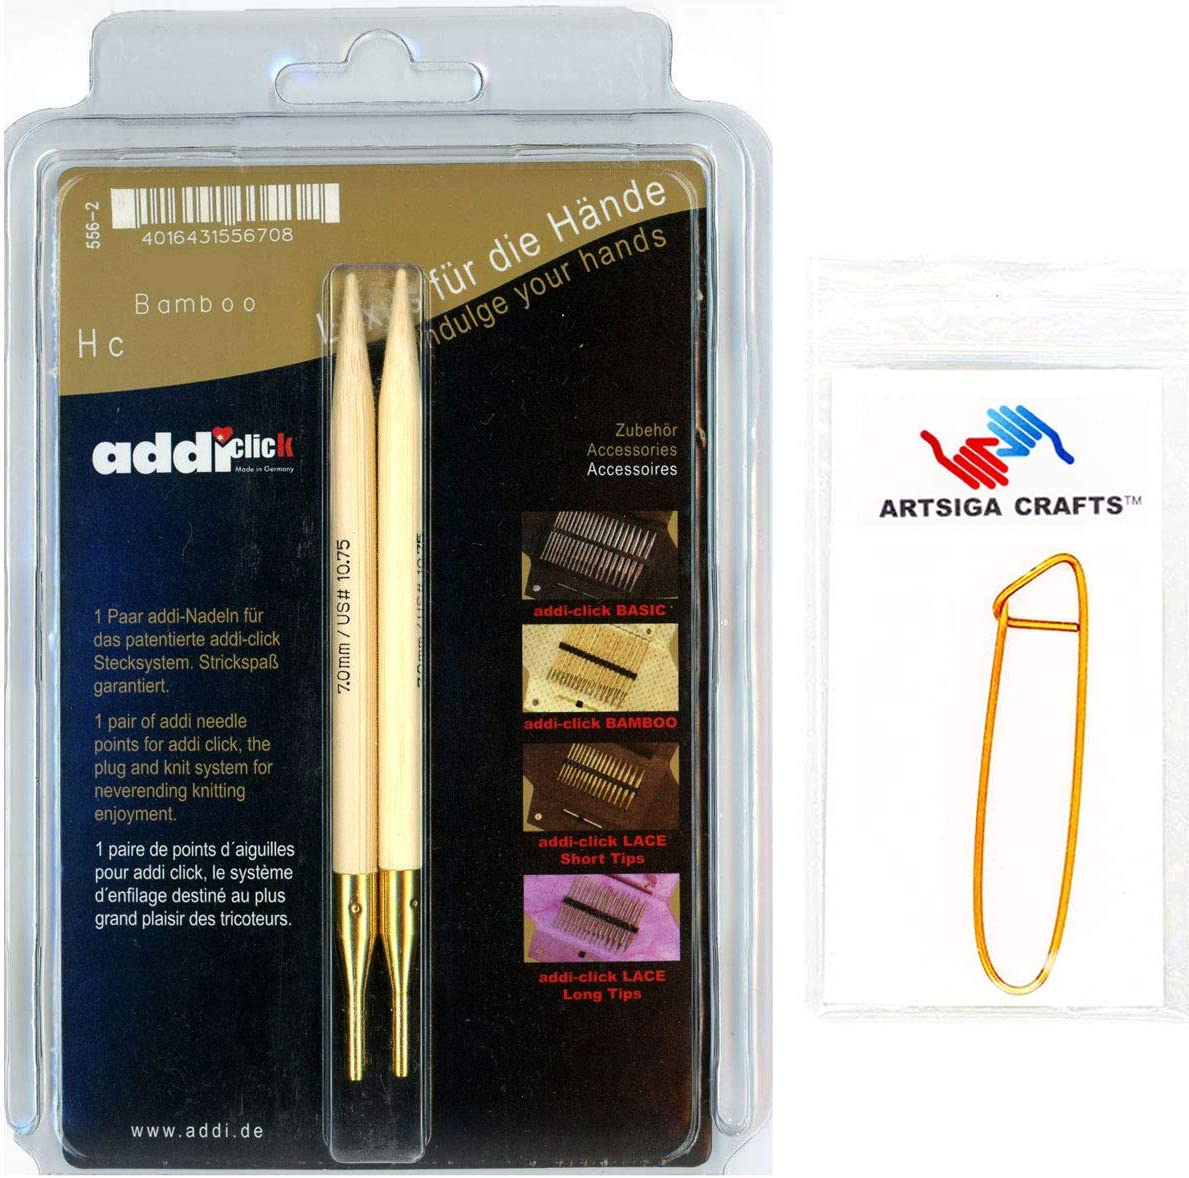 Bambus addi Click Bamboo Spitzen 13 cm B/ündel mit 1 Artsiga Crafts Aluminium Maschenhalter 13cm//3.75mm